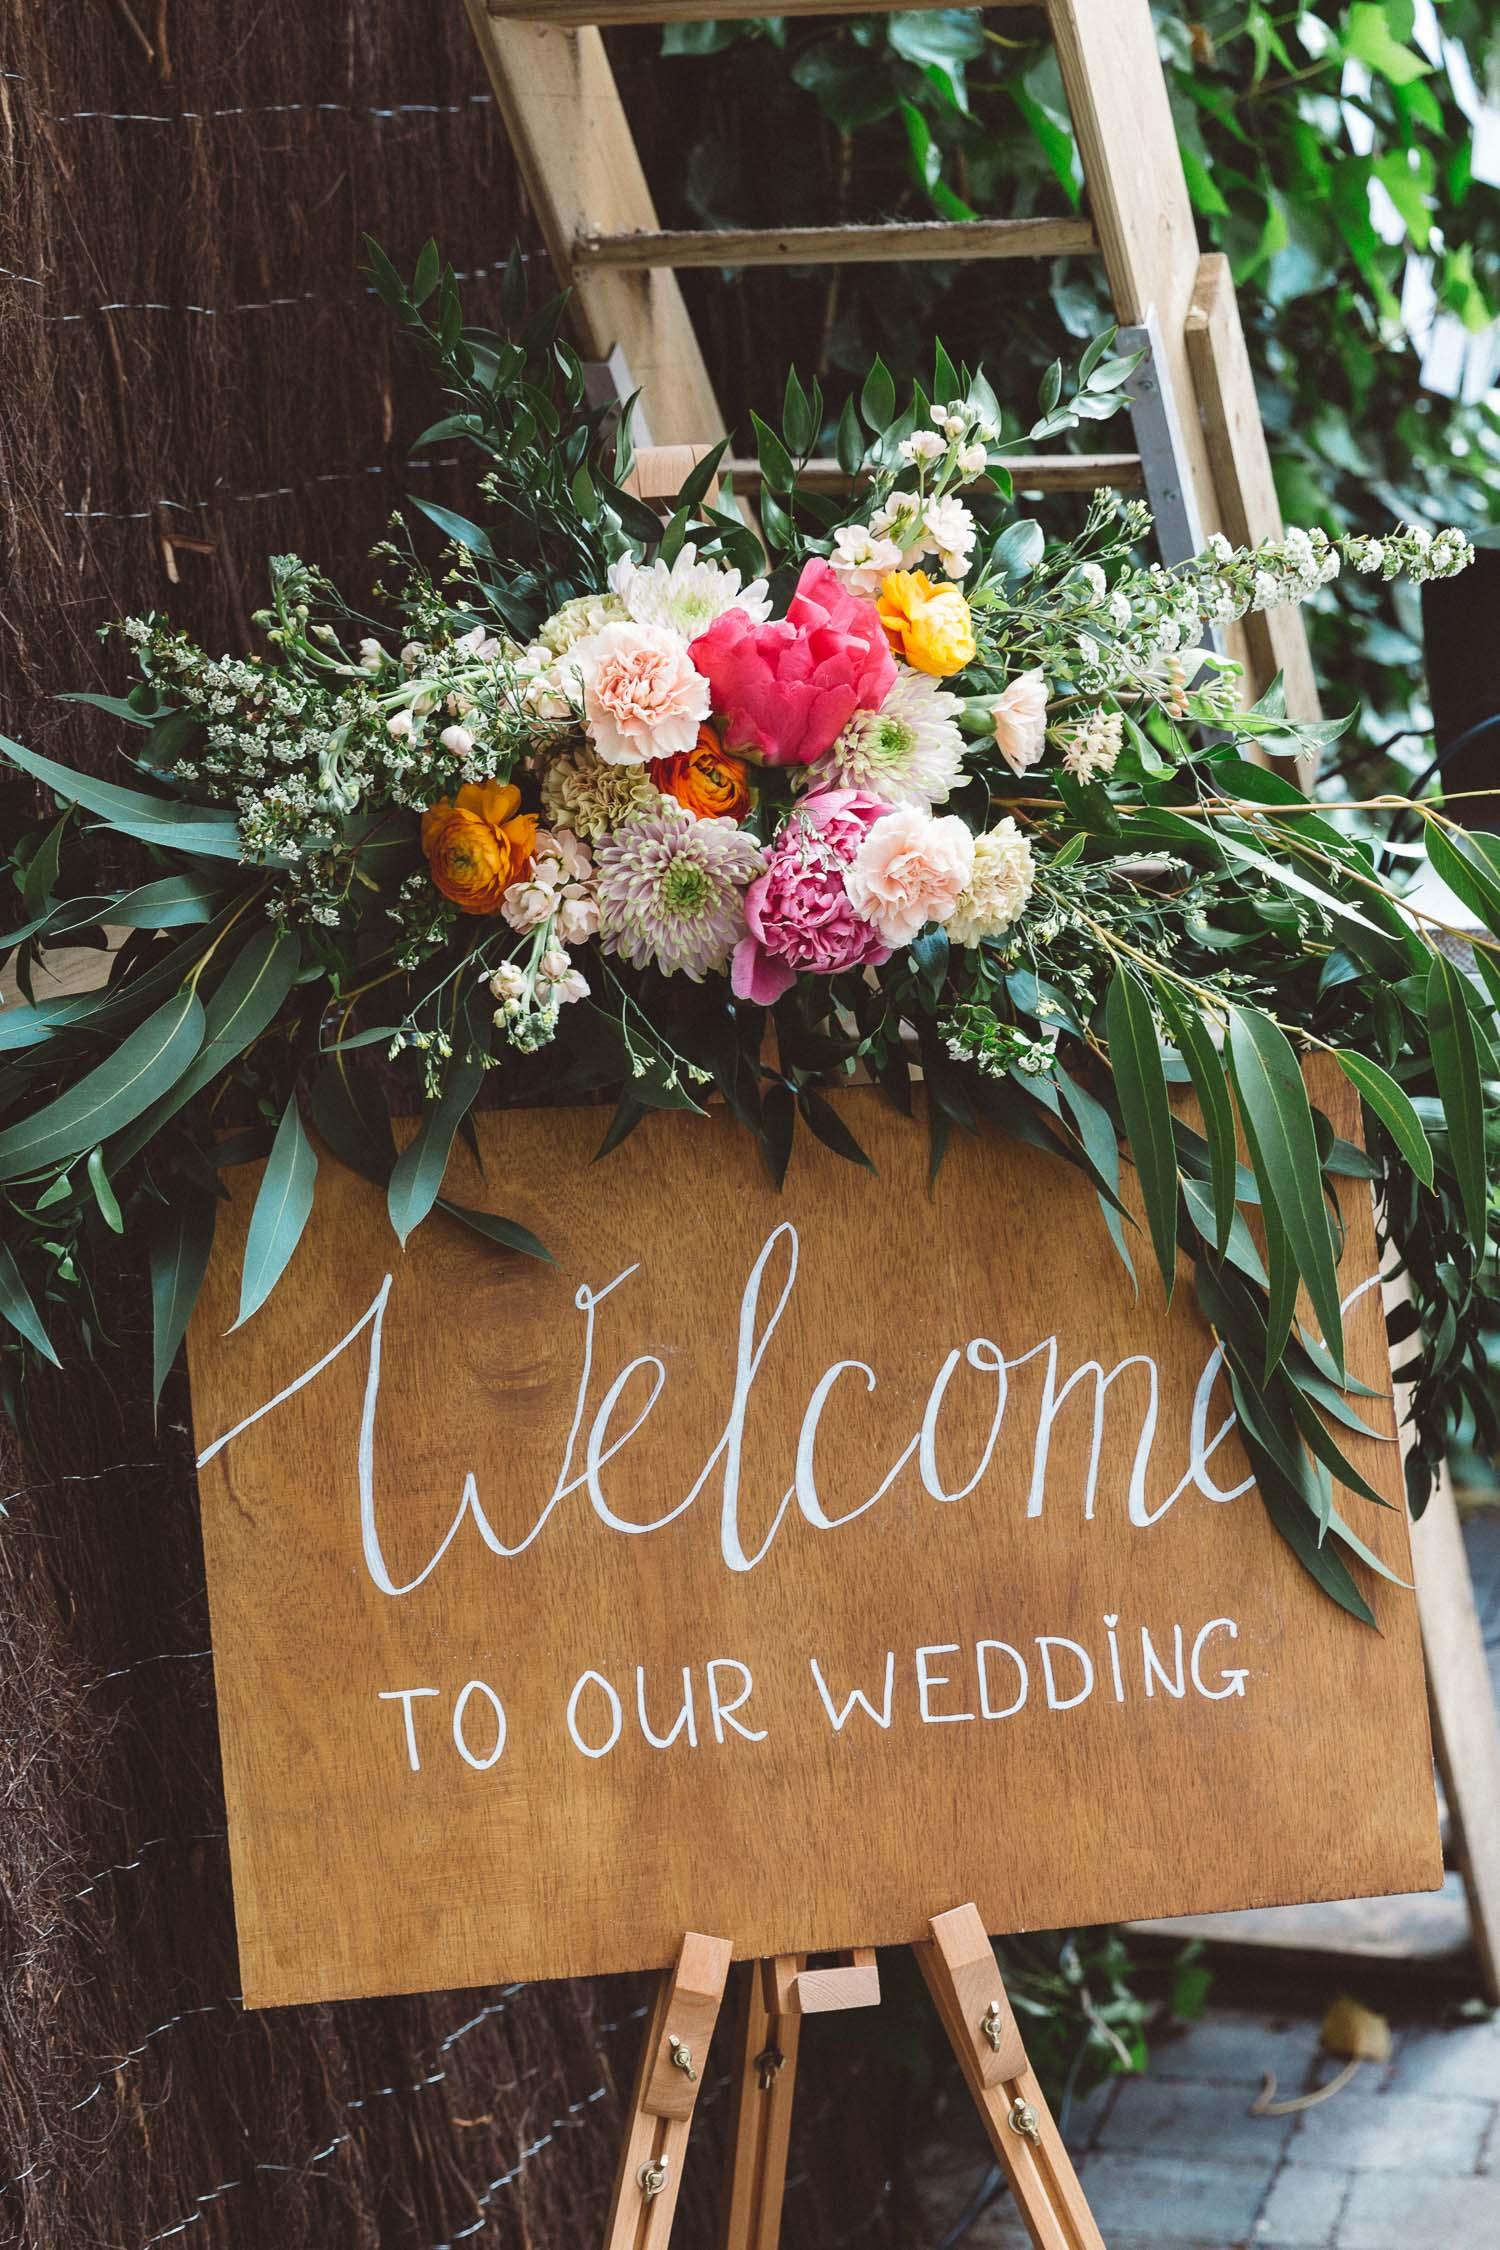 Backyard-wedding-Bruiloft-Annemiek-David-fotografie-photography-On-a-hazy-morning-Amsterdam-The-Netherlands362.jpg